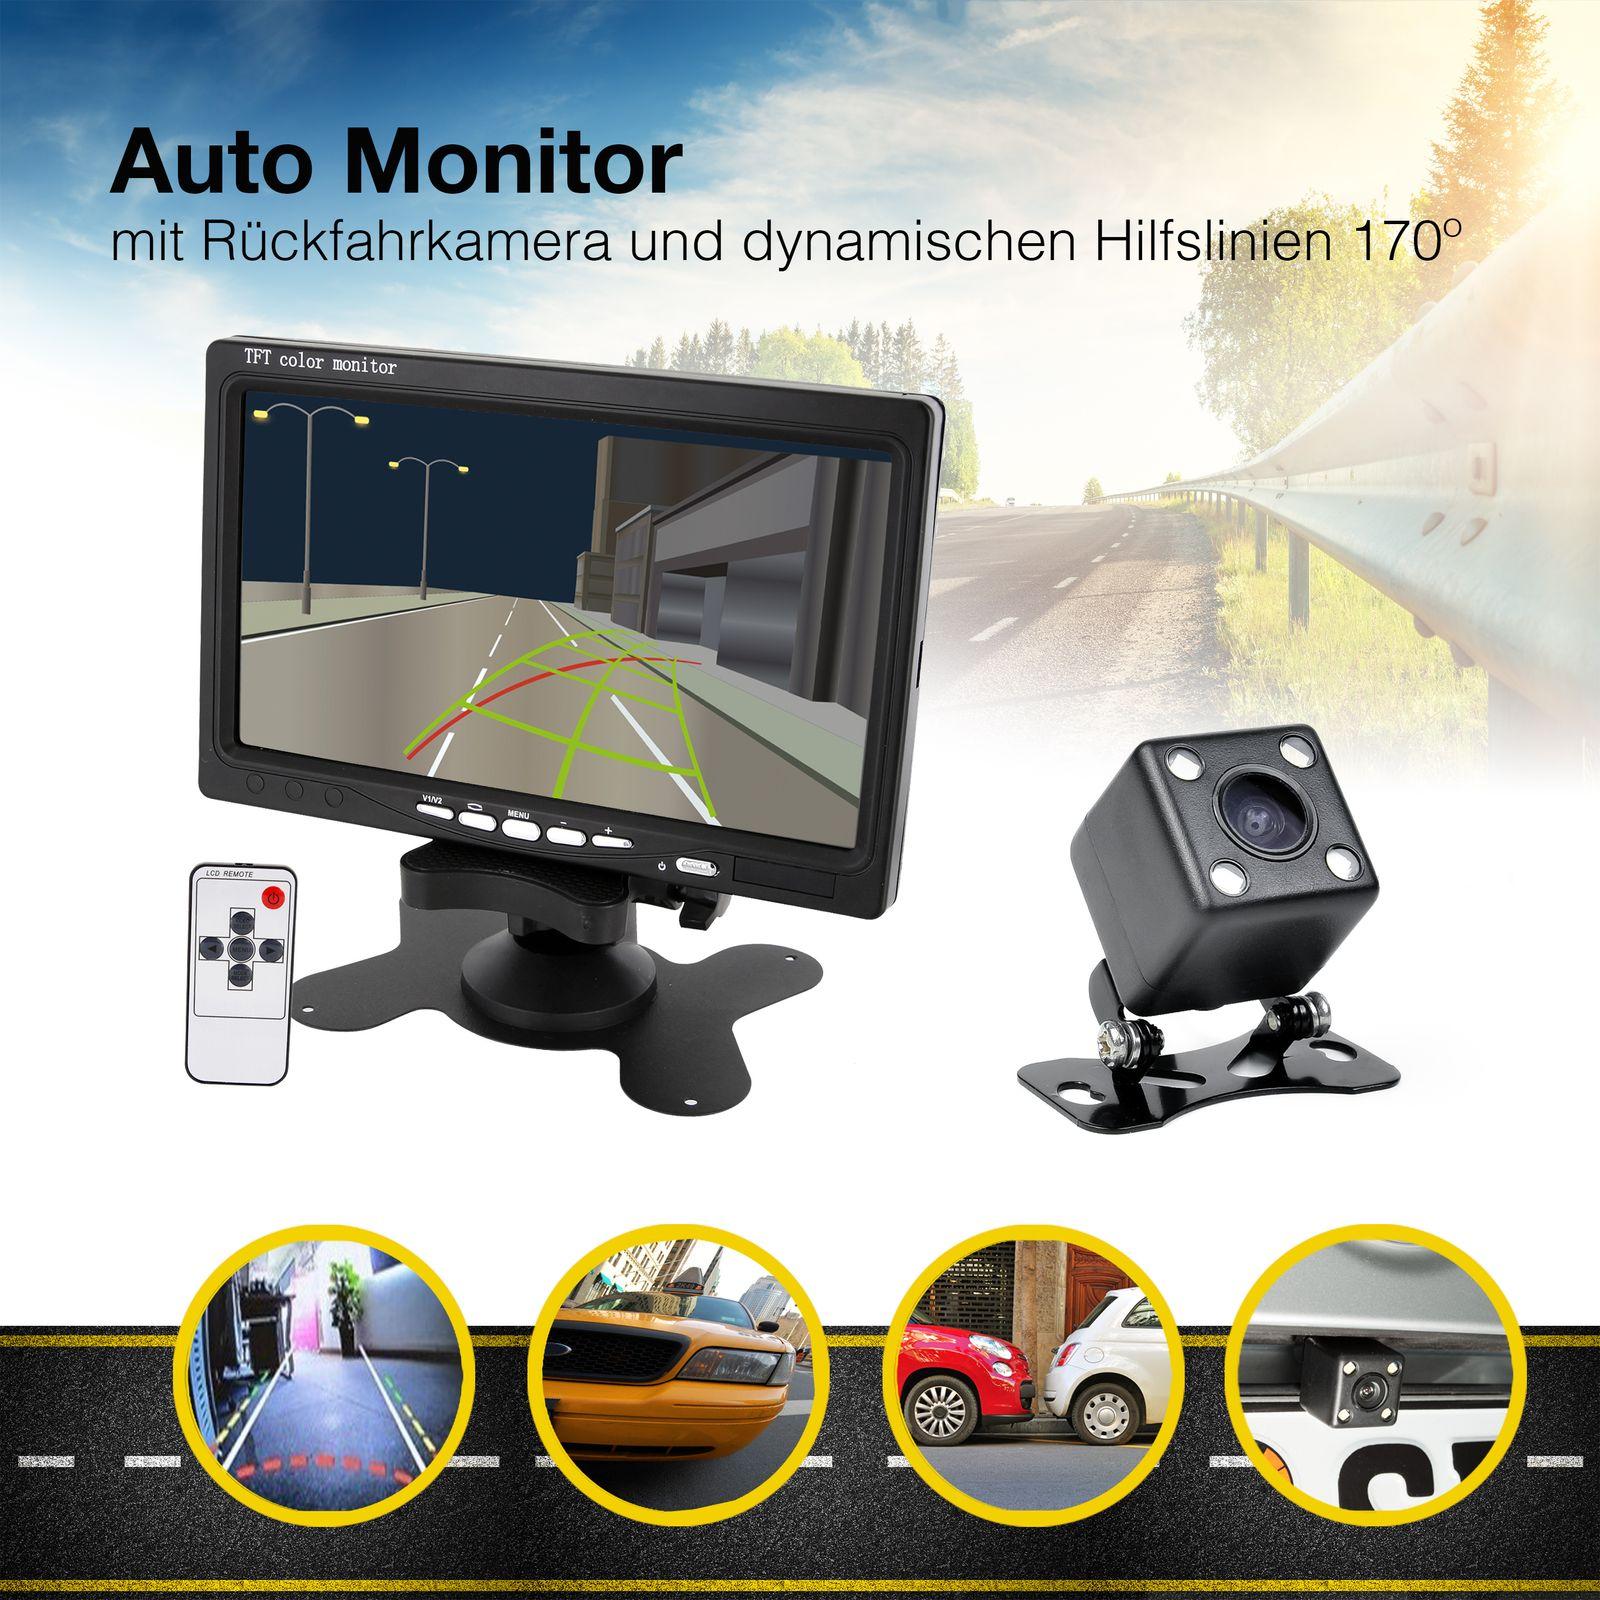 17,8cm 7 Zoll Auto TFT LCD Digital Monitor Stand Einbaurahmen Automonitor für Rückfahrkamera mit digitalem Display